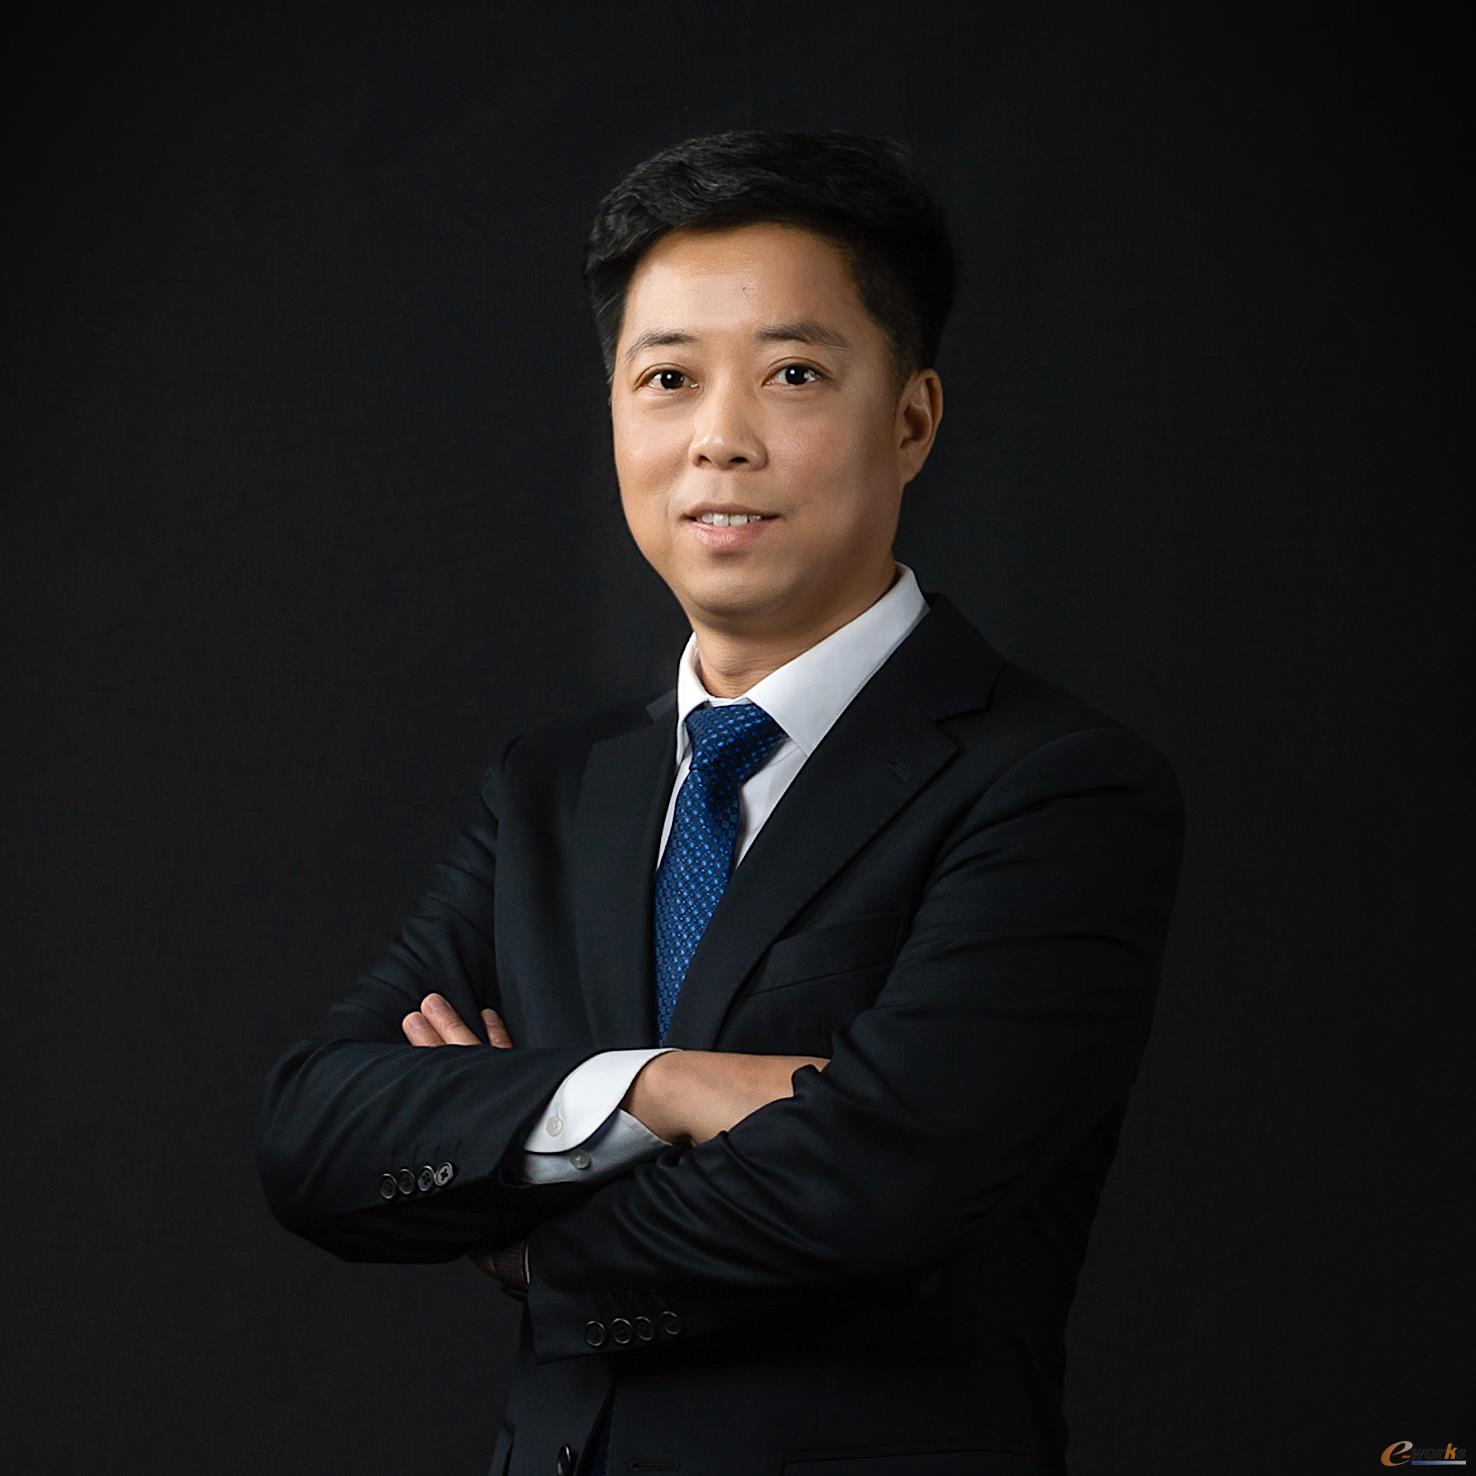 EPLAN大中华区技术总监吴爱国先生